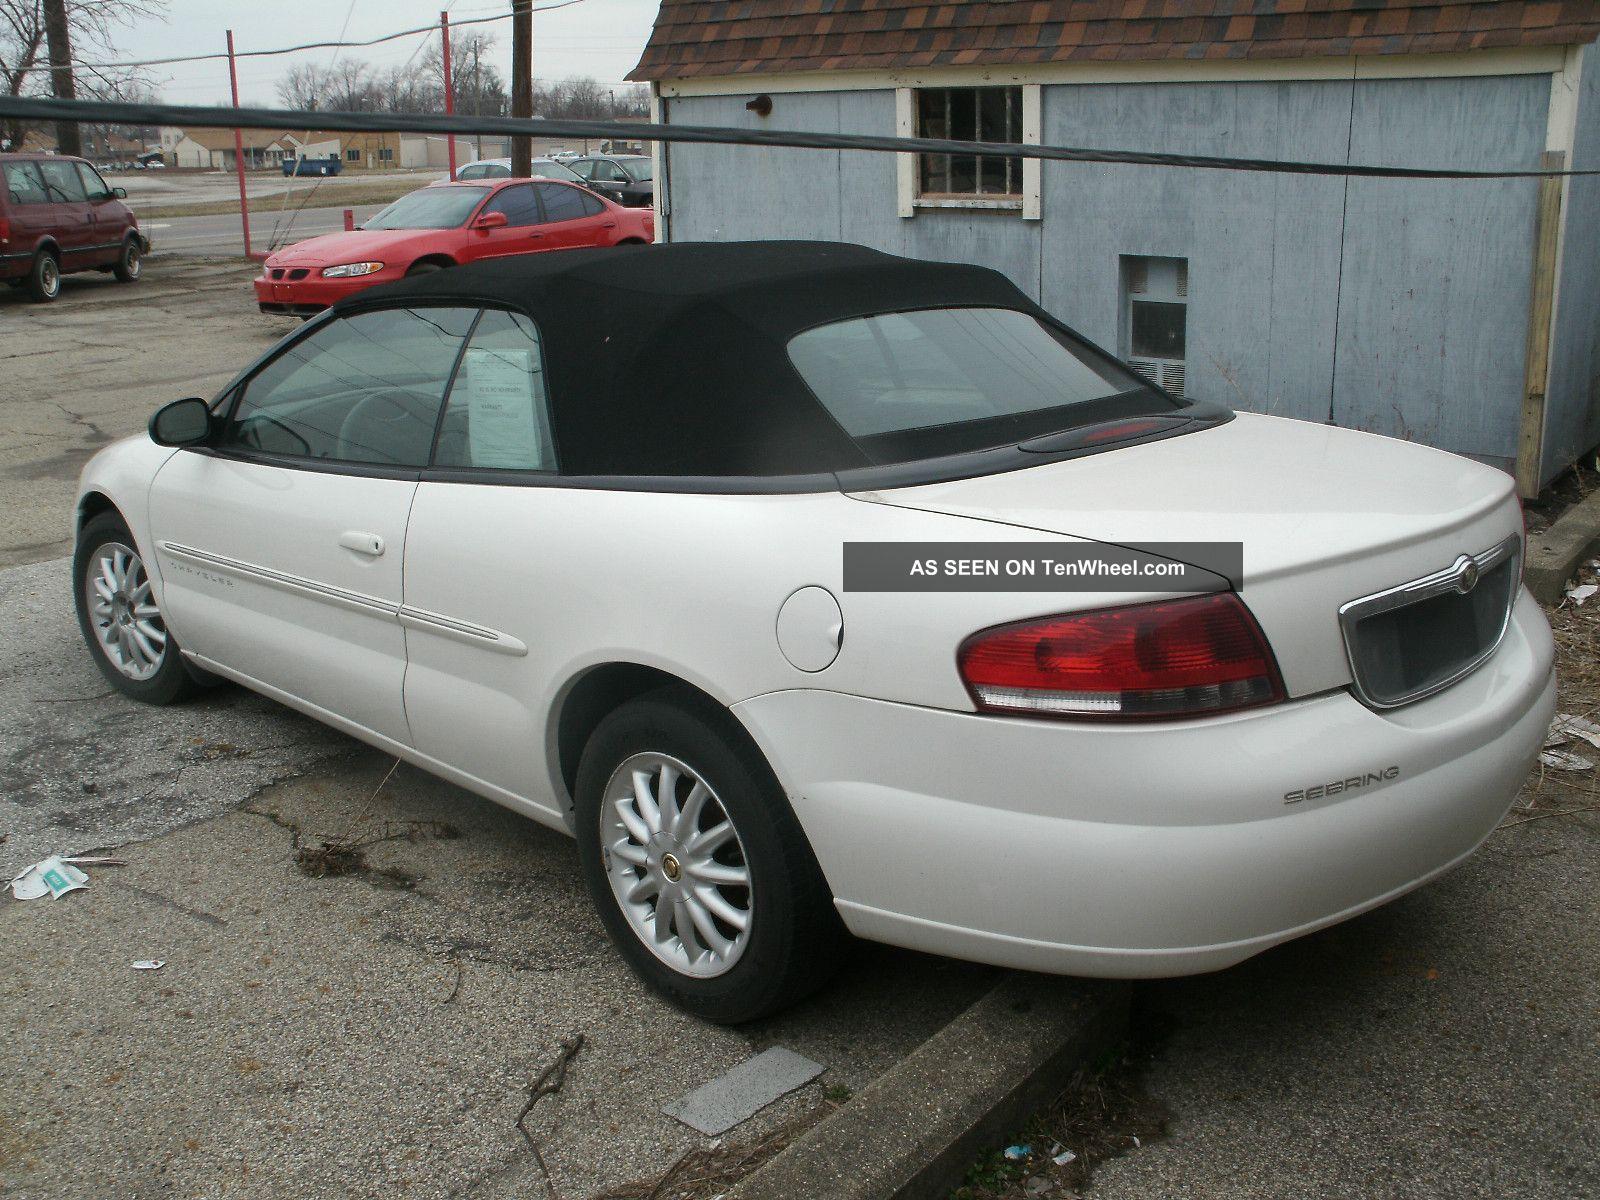 2001 Chrysler Sebring Convertible Lxi